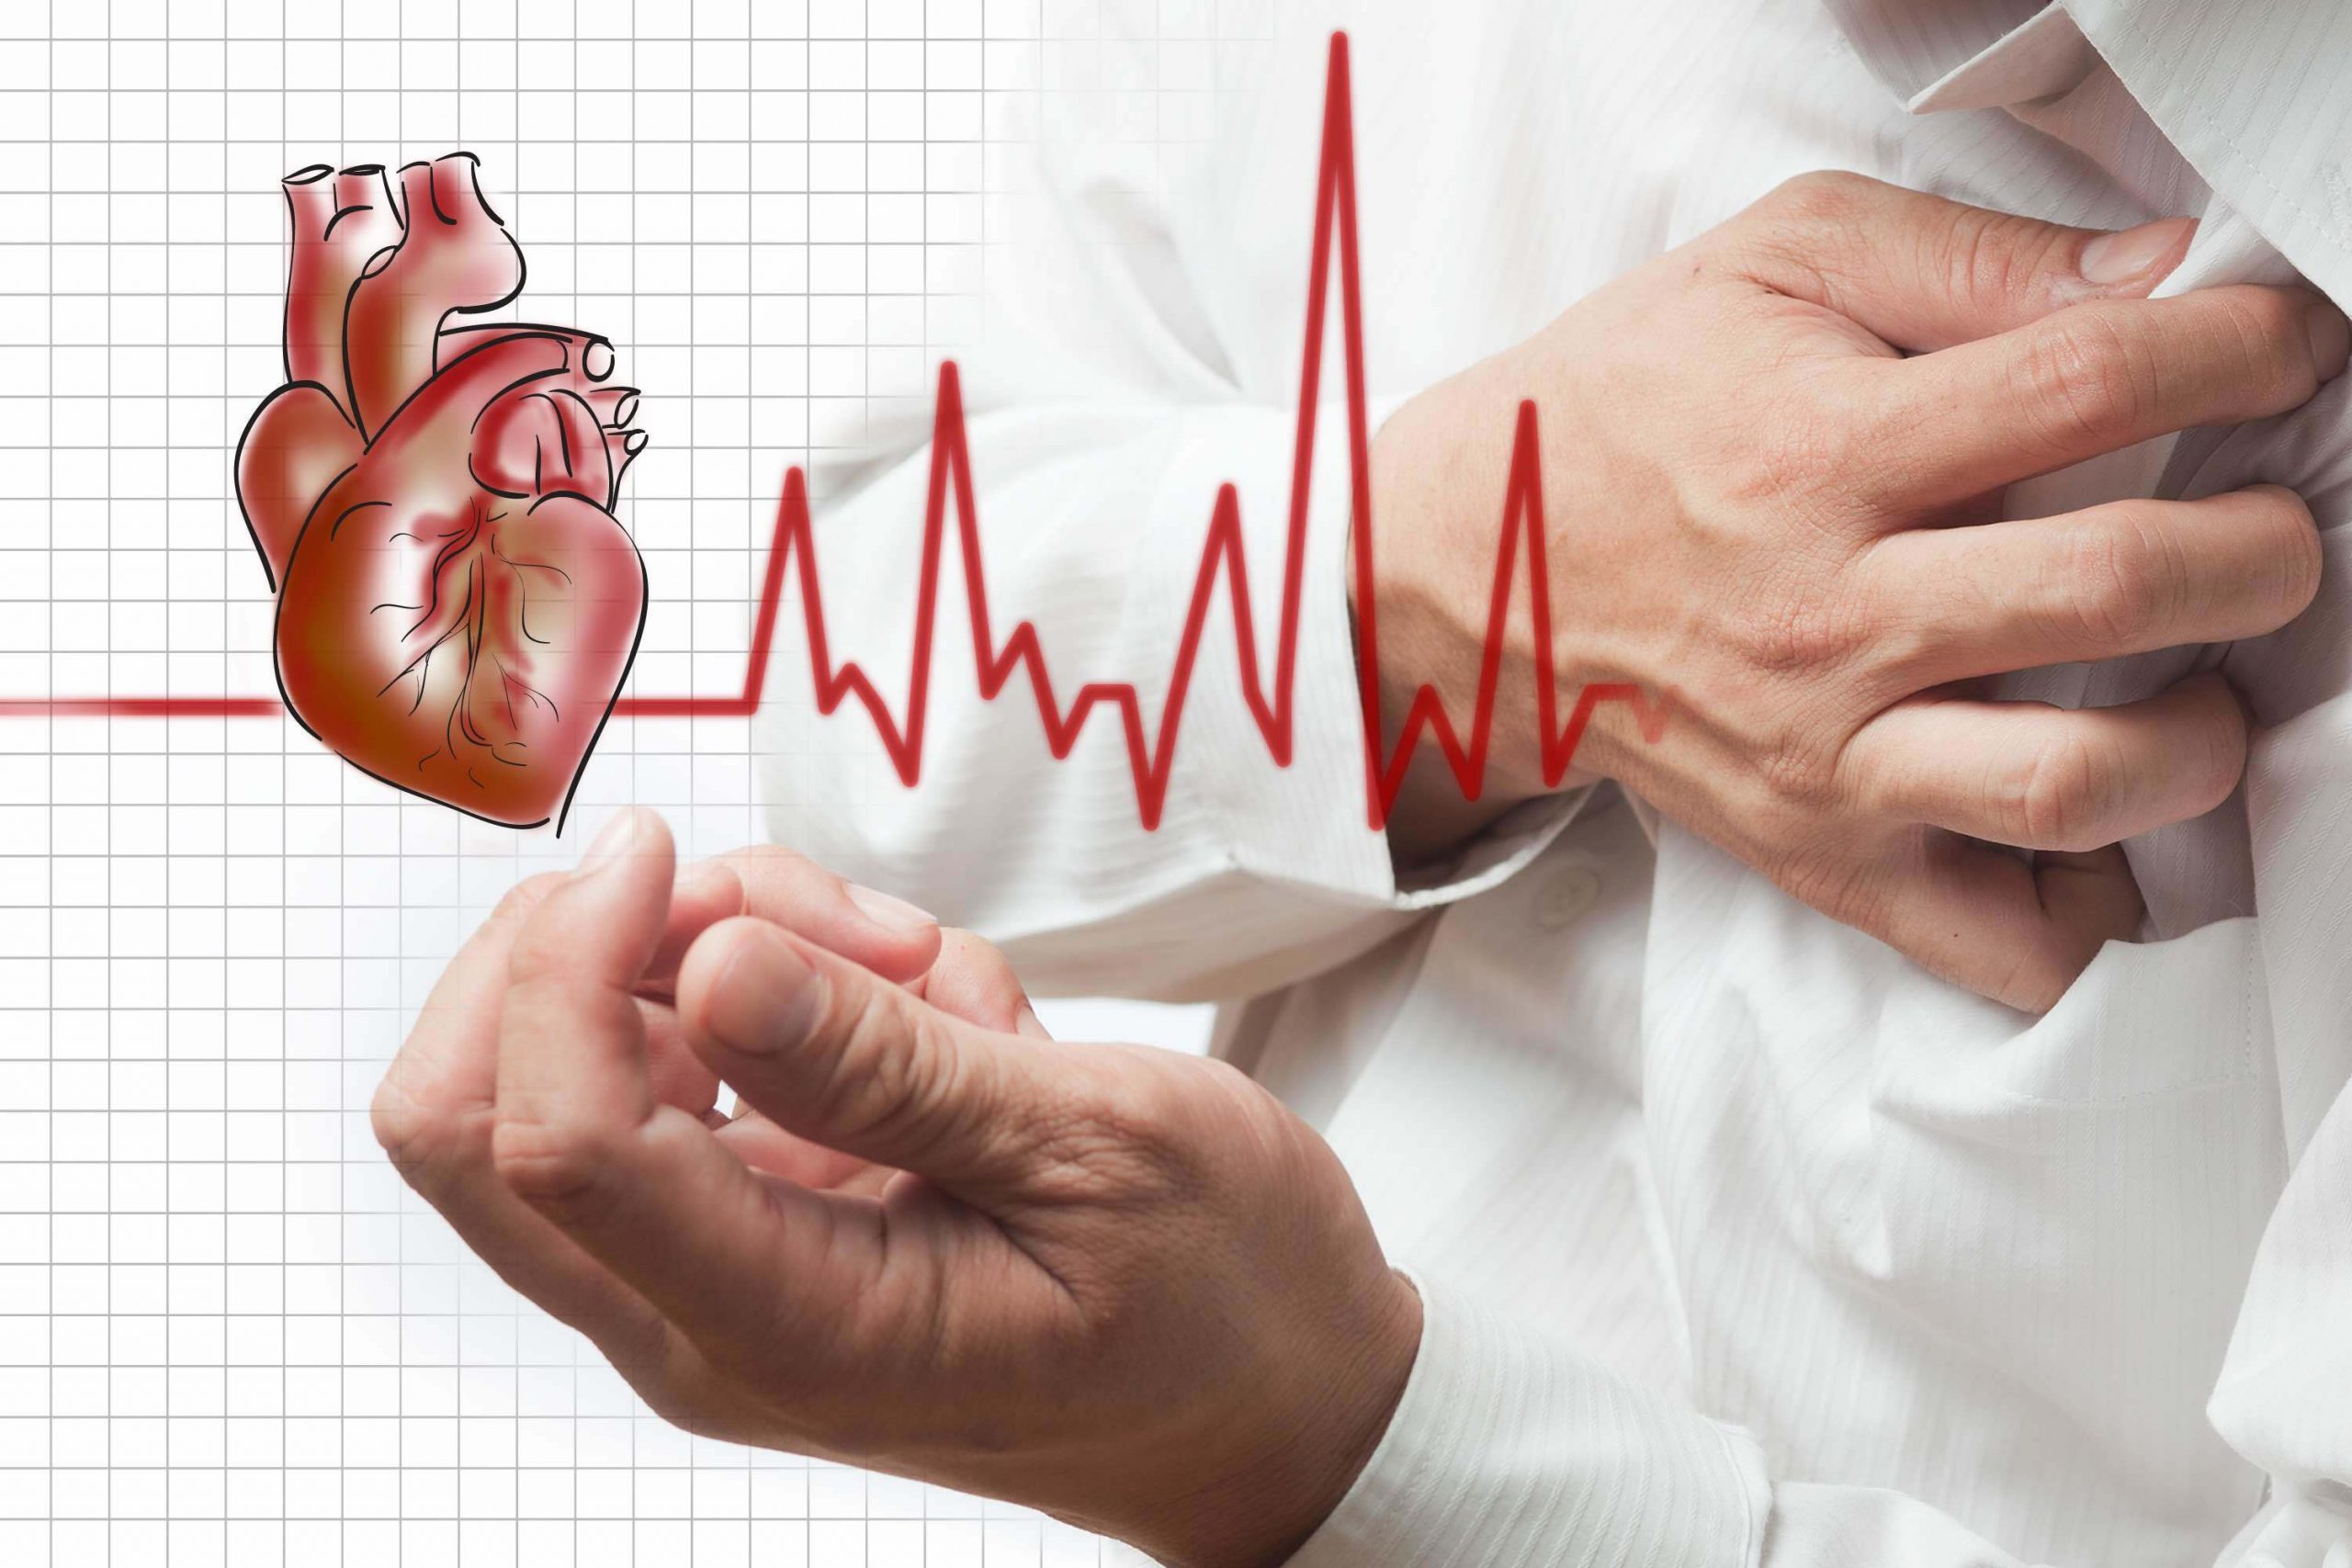 Tροπονίνη: Σε ασθενείς με βαριά λοίμωξη COVID-19